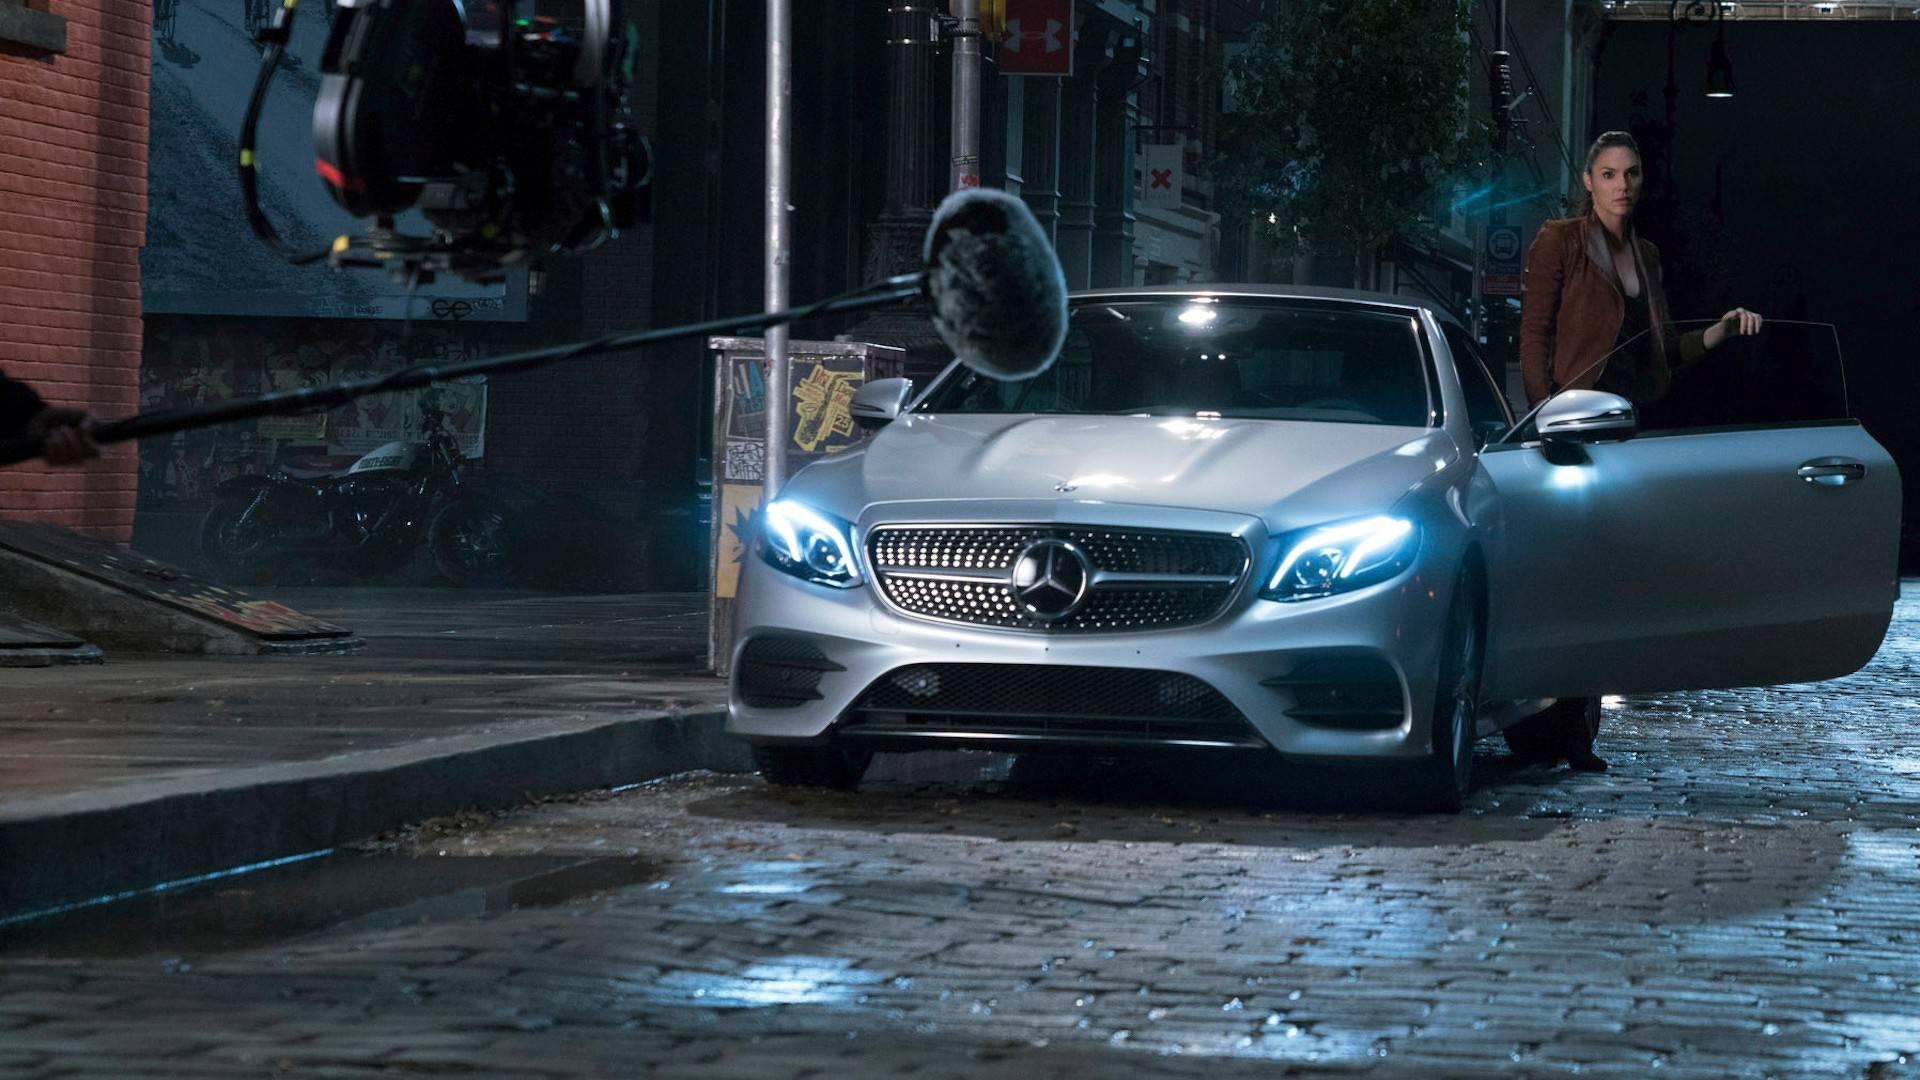 Mercedes amg vision gran turismo akan tampil di film for Justice league mercedes benz